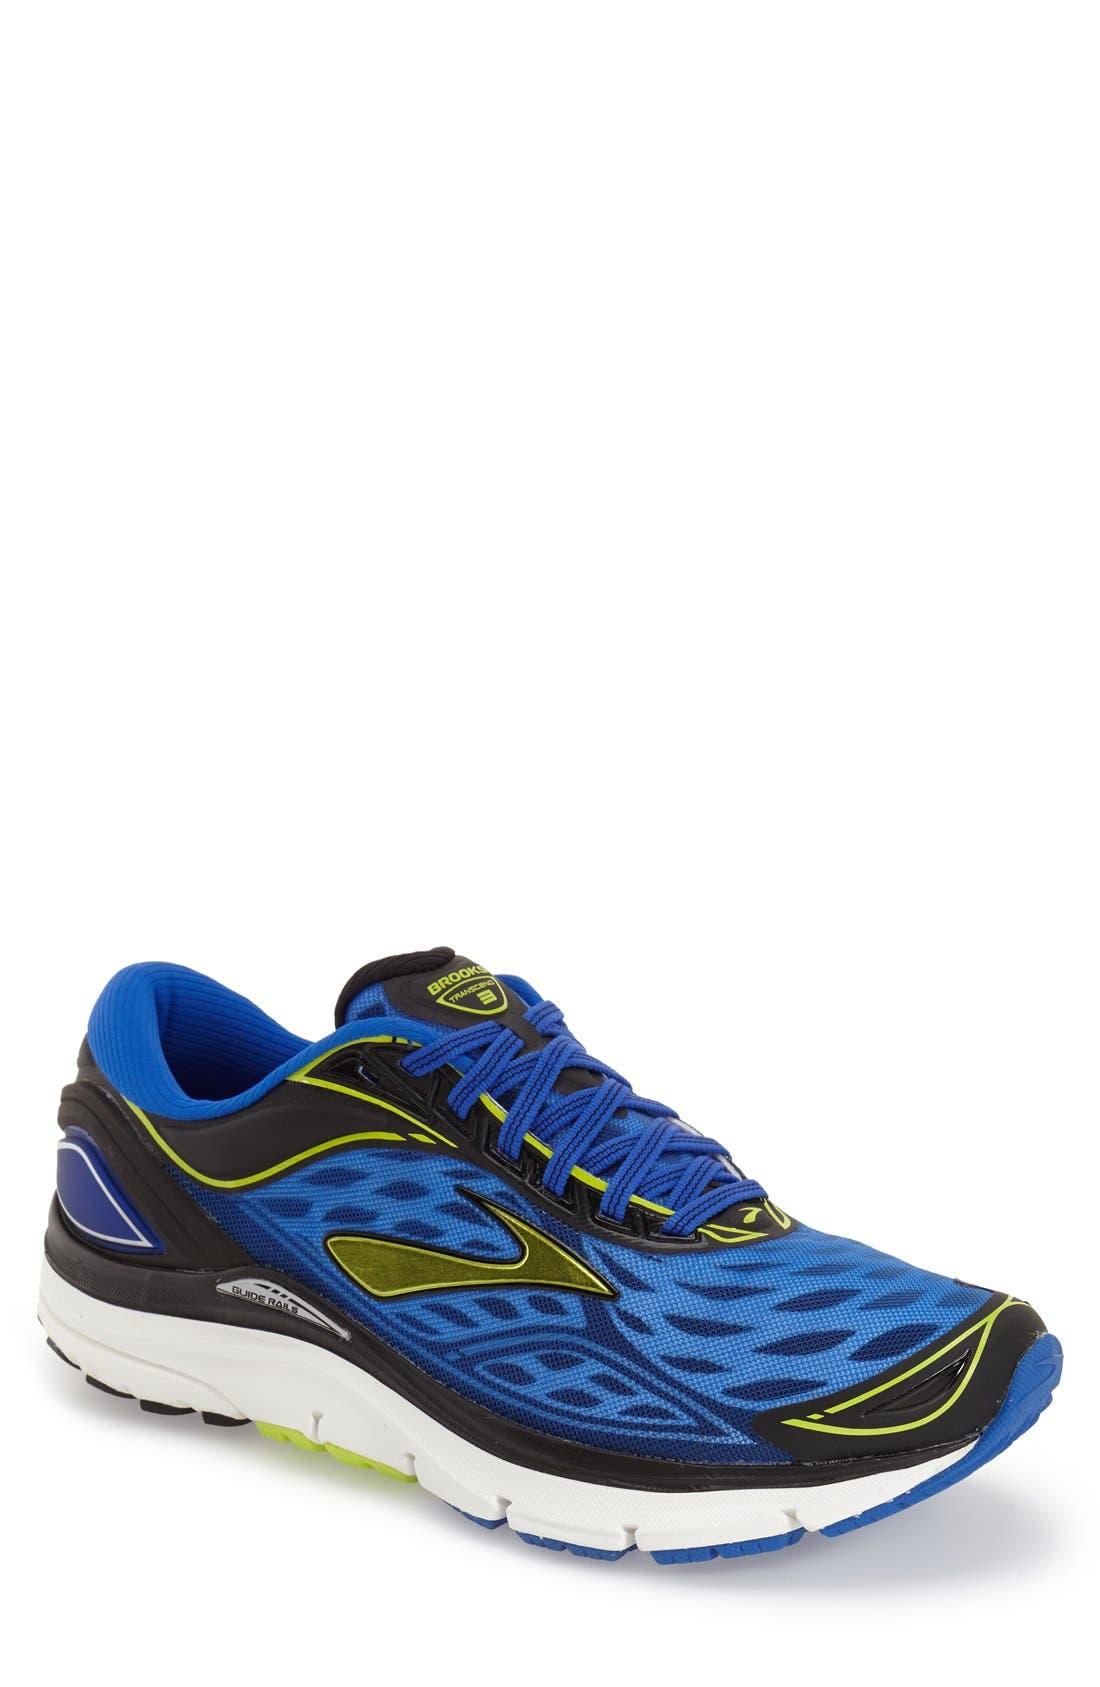 'Transcend 3' Running Shoe,                         Main,                         color, Electric Blue/ Lime/ Black